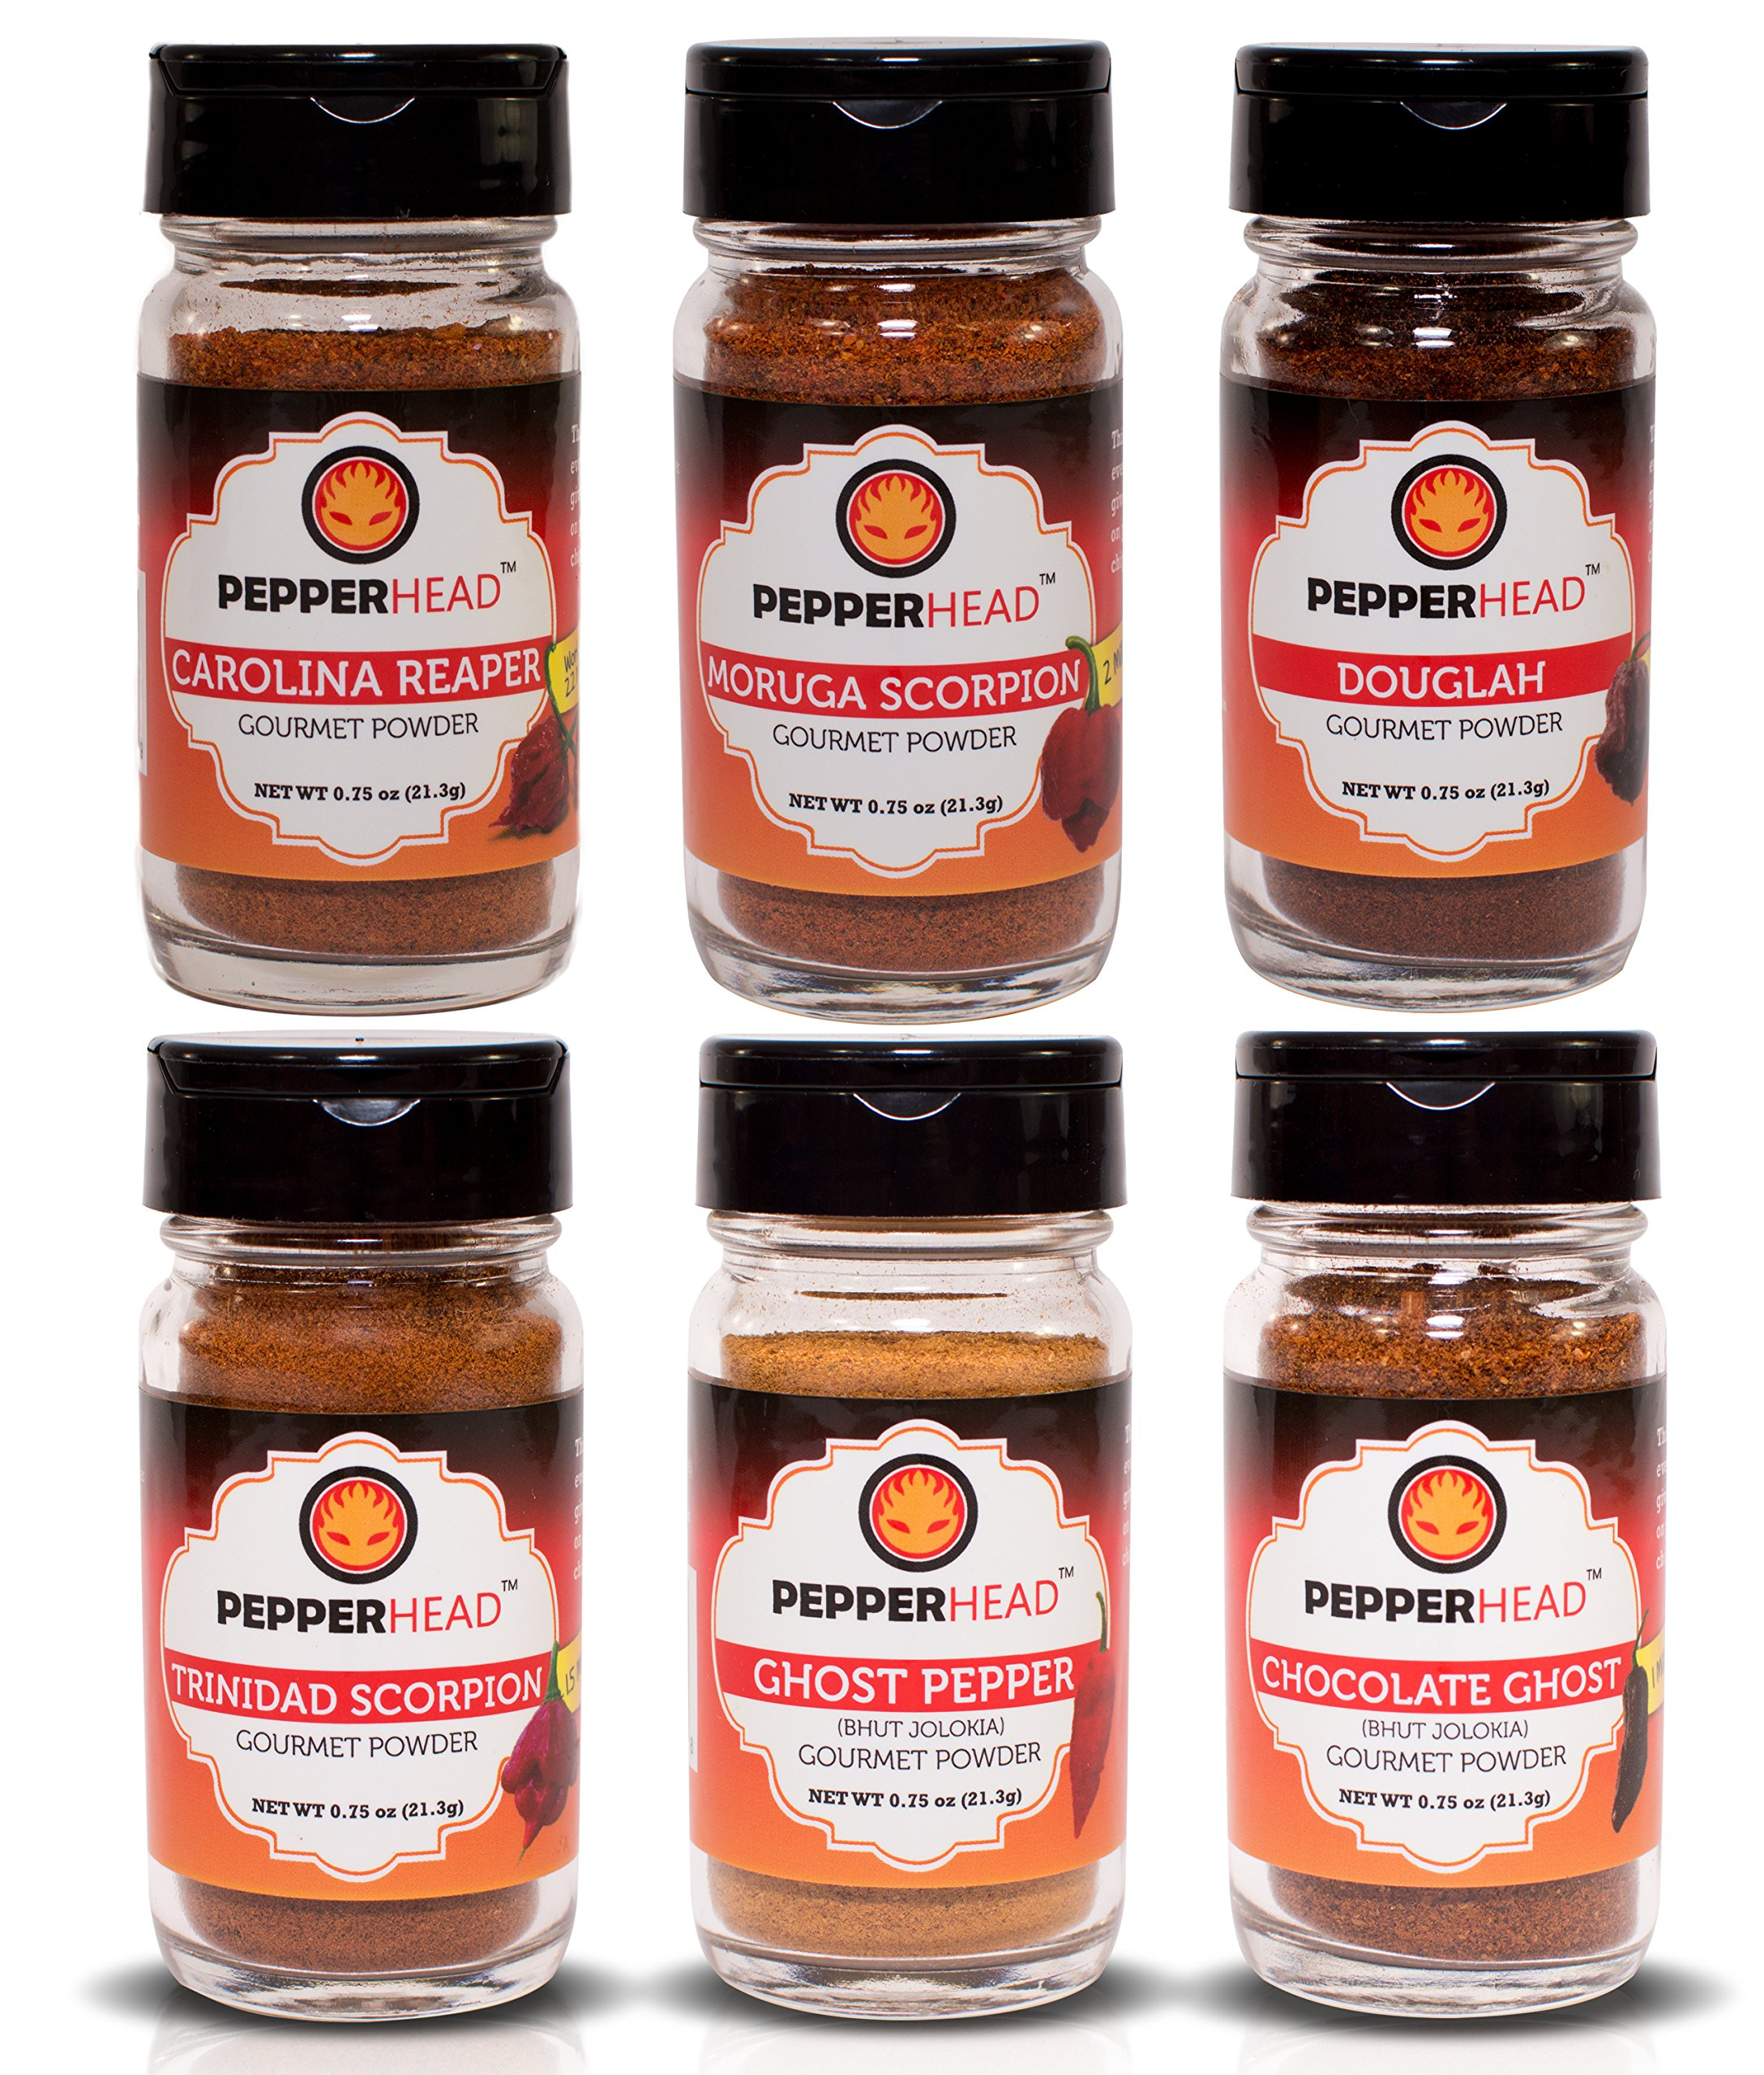 6 Hottest Gourmet Powders Combo Pack - PepperHead - Carolina Reaper, Moruga Scorpion, Douglah, Trinidad Scorpion, Ghost, Chocolate Ghost